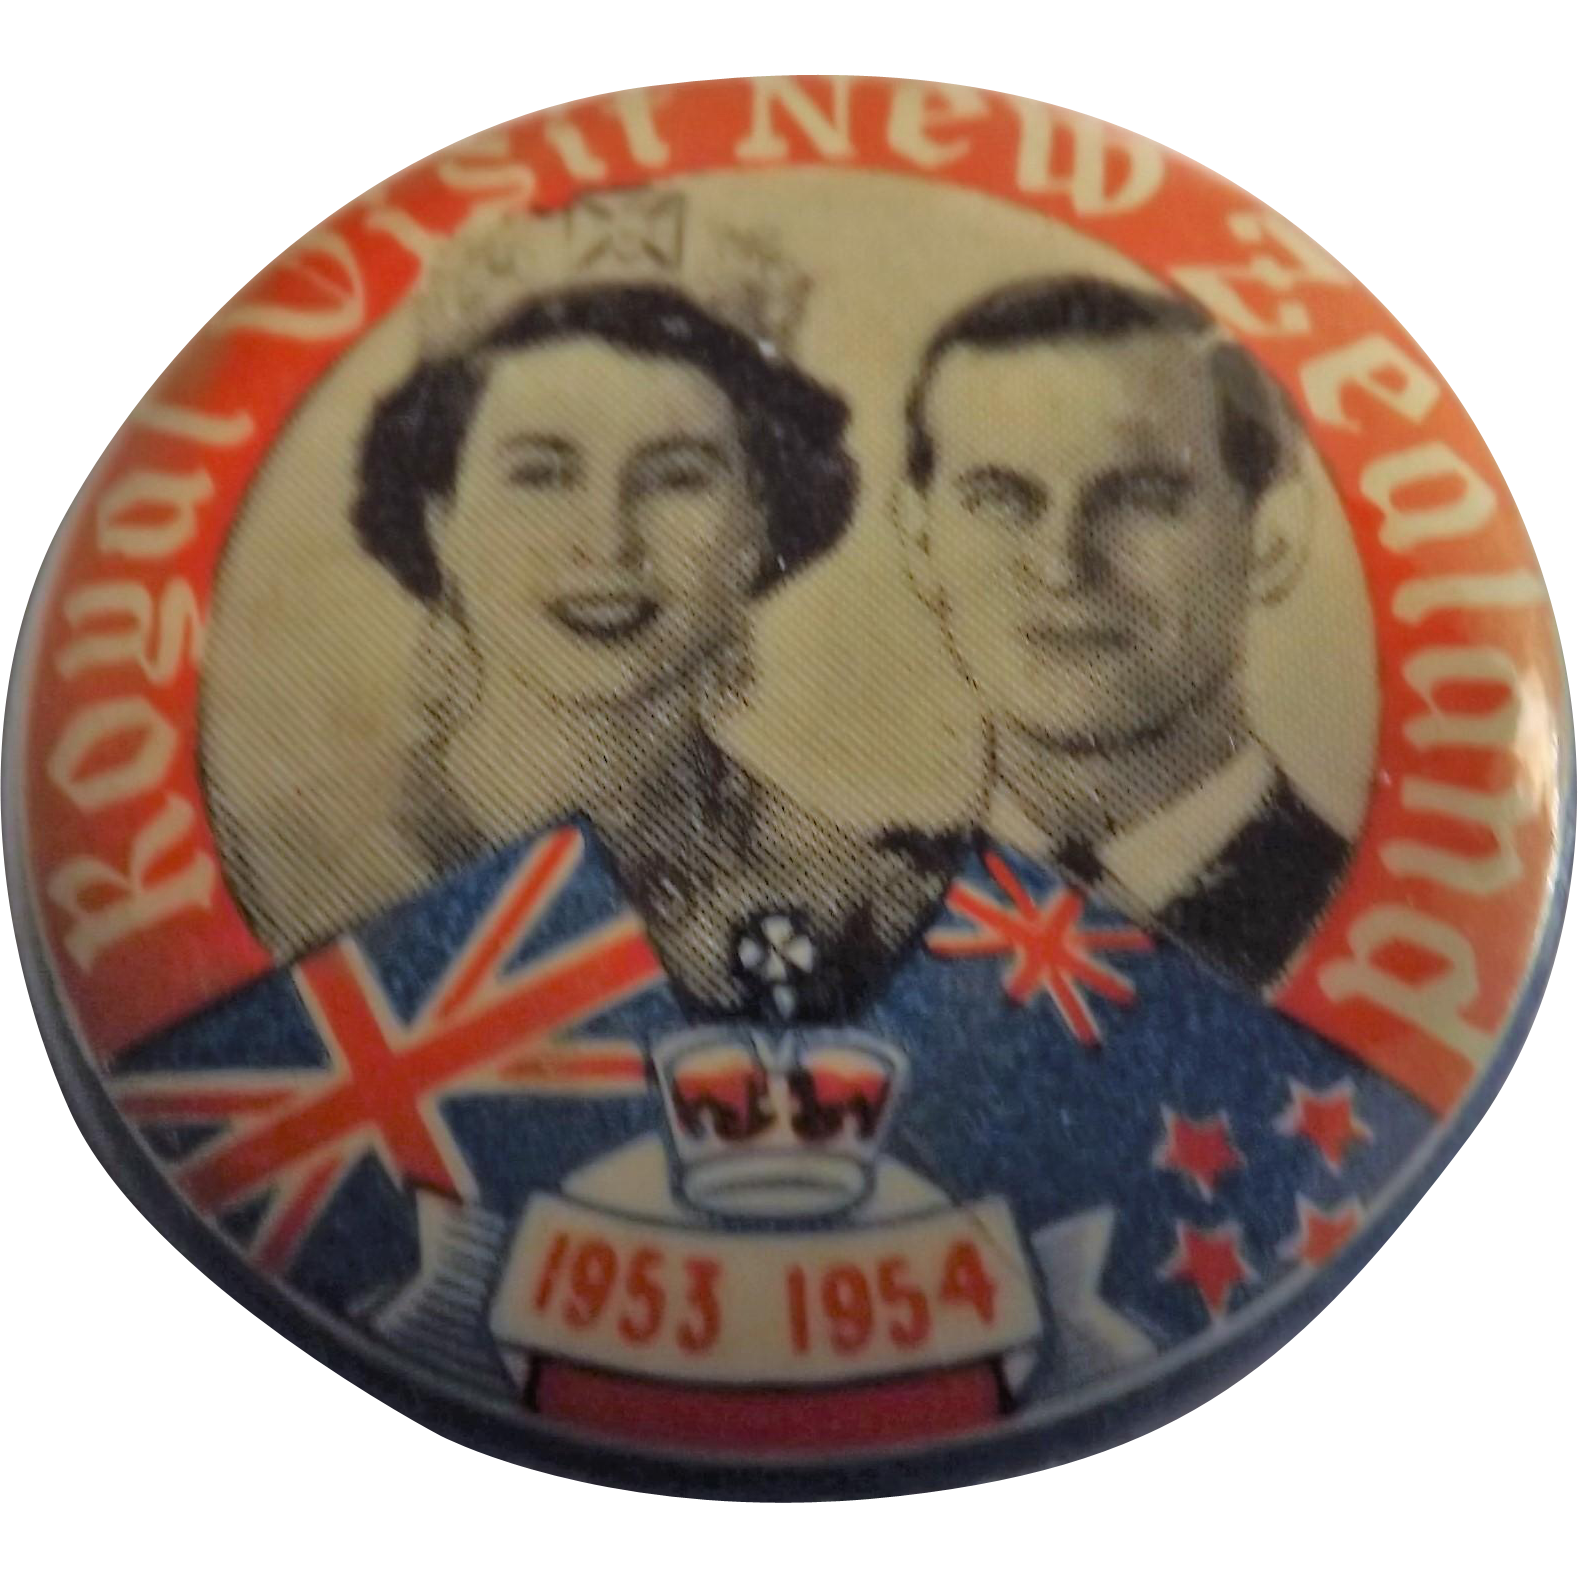 Royal Visit New Zealand 1953-1954 Queen Elizabeth & Prince Philip